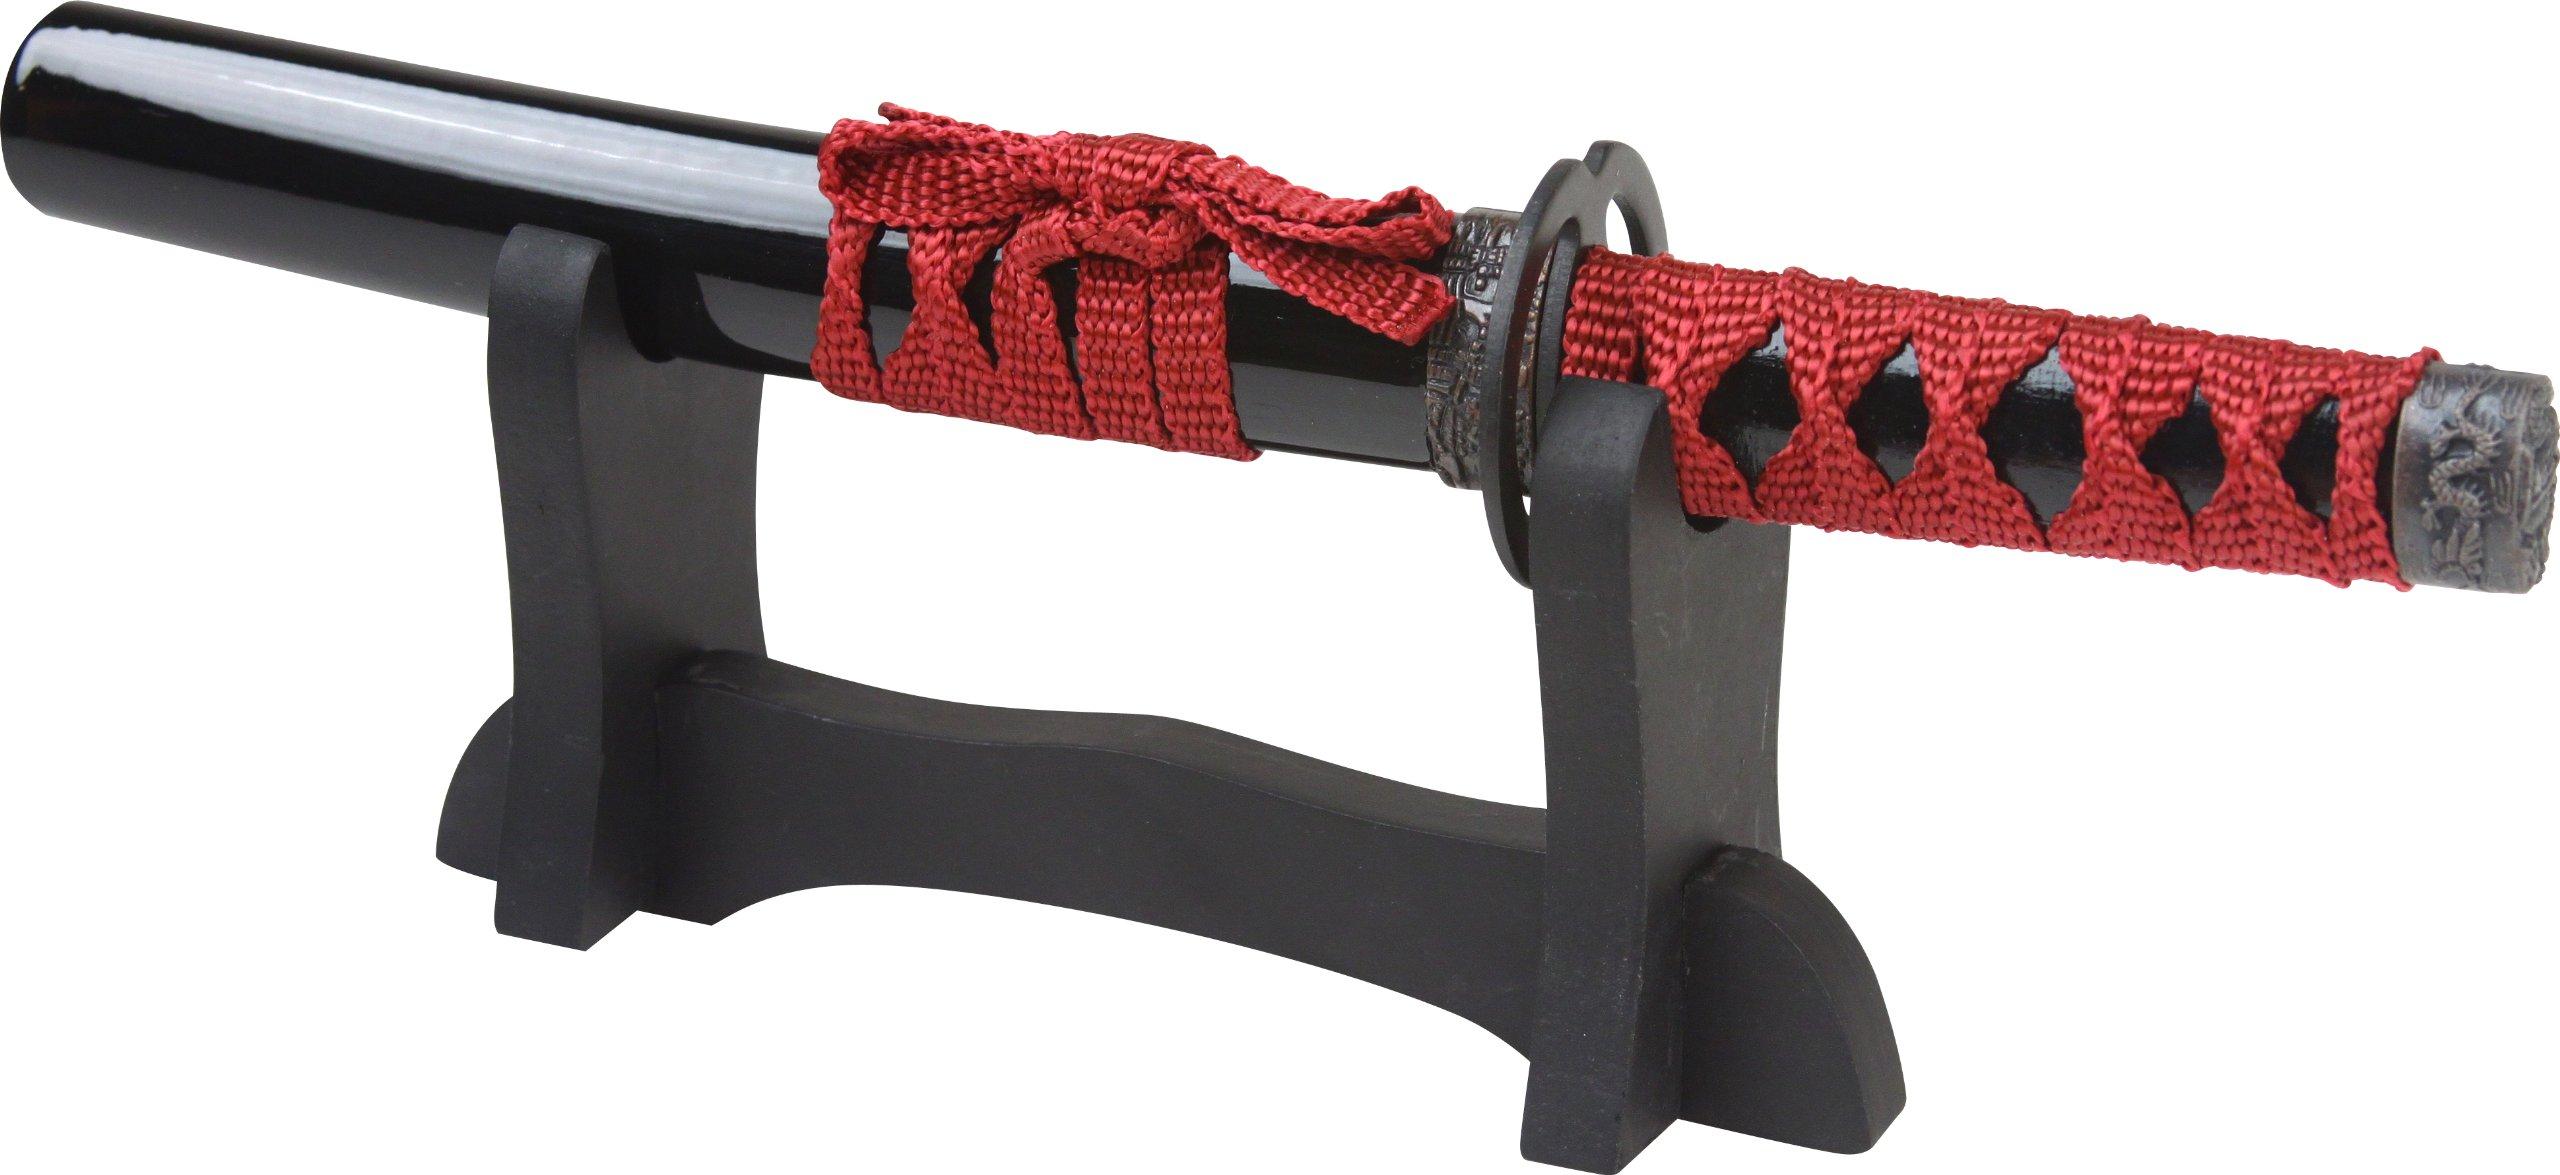 BladesUSA Sw 1811Bk Samurai 9 5 Inch Overall